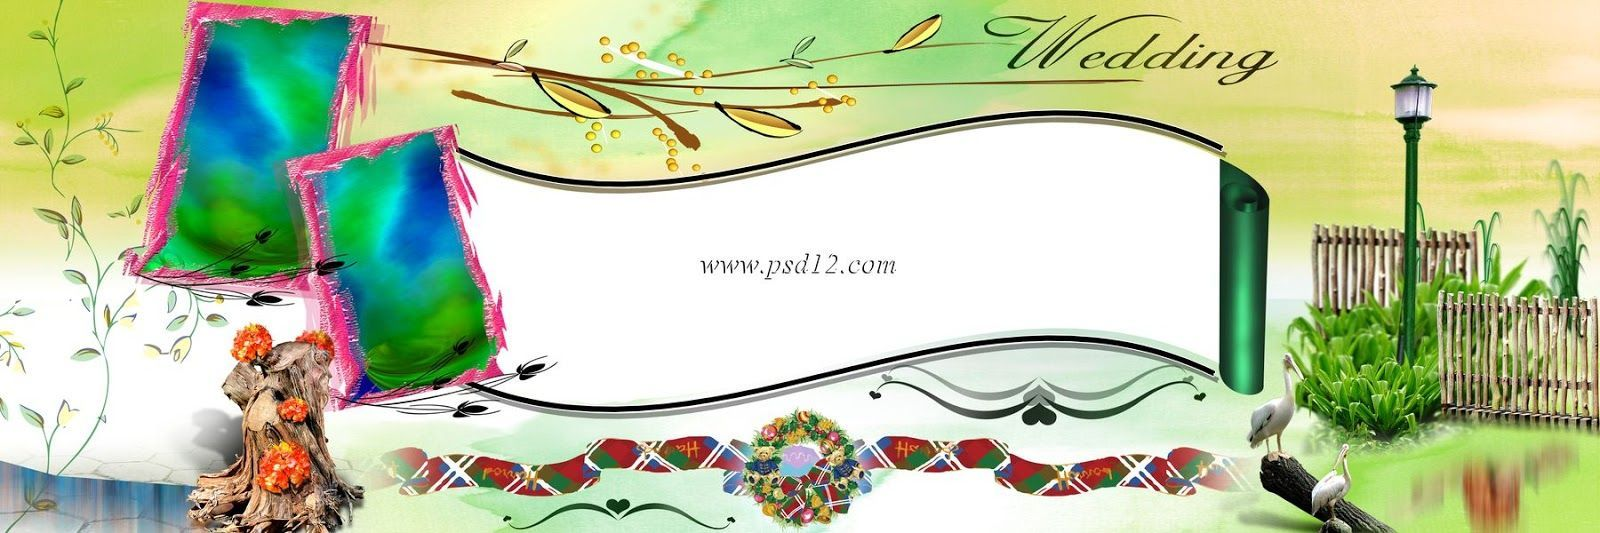 Muslim Wedding Cards Design Psd Files Free Download Tutalo